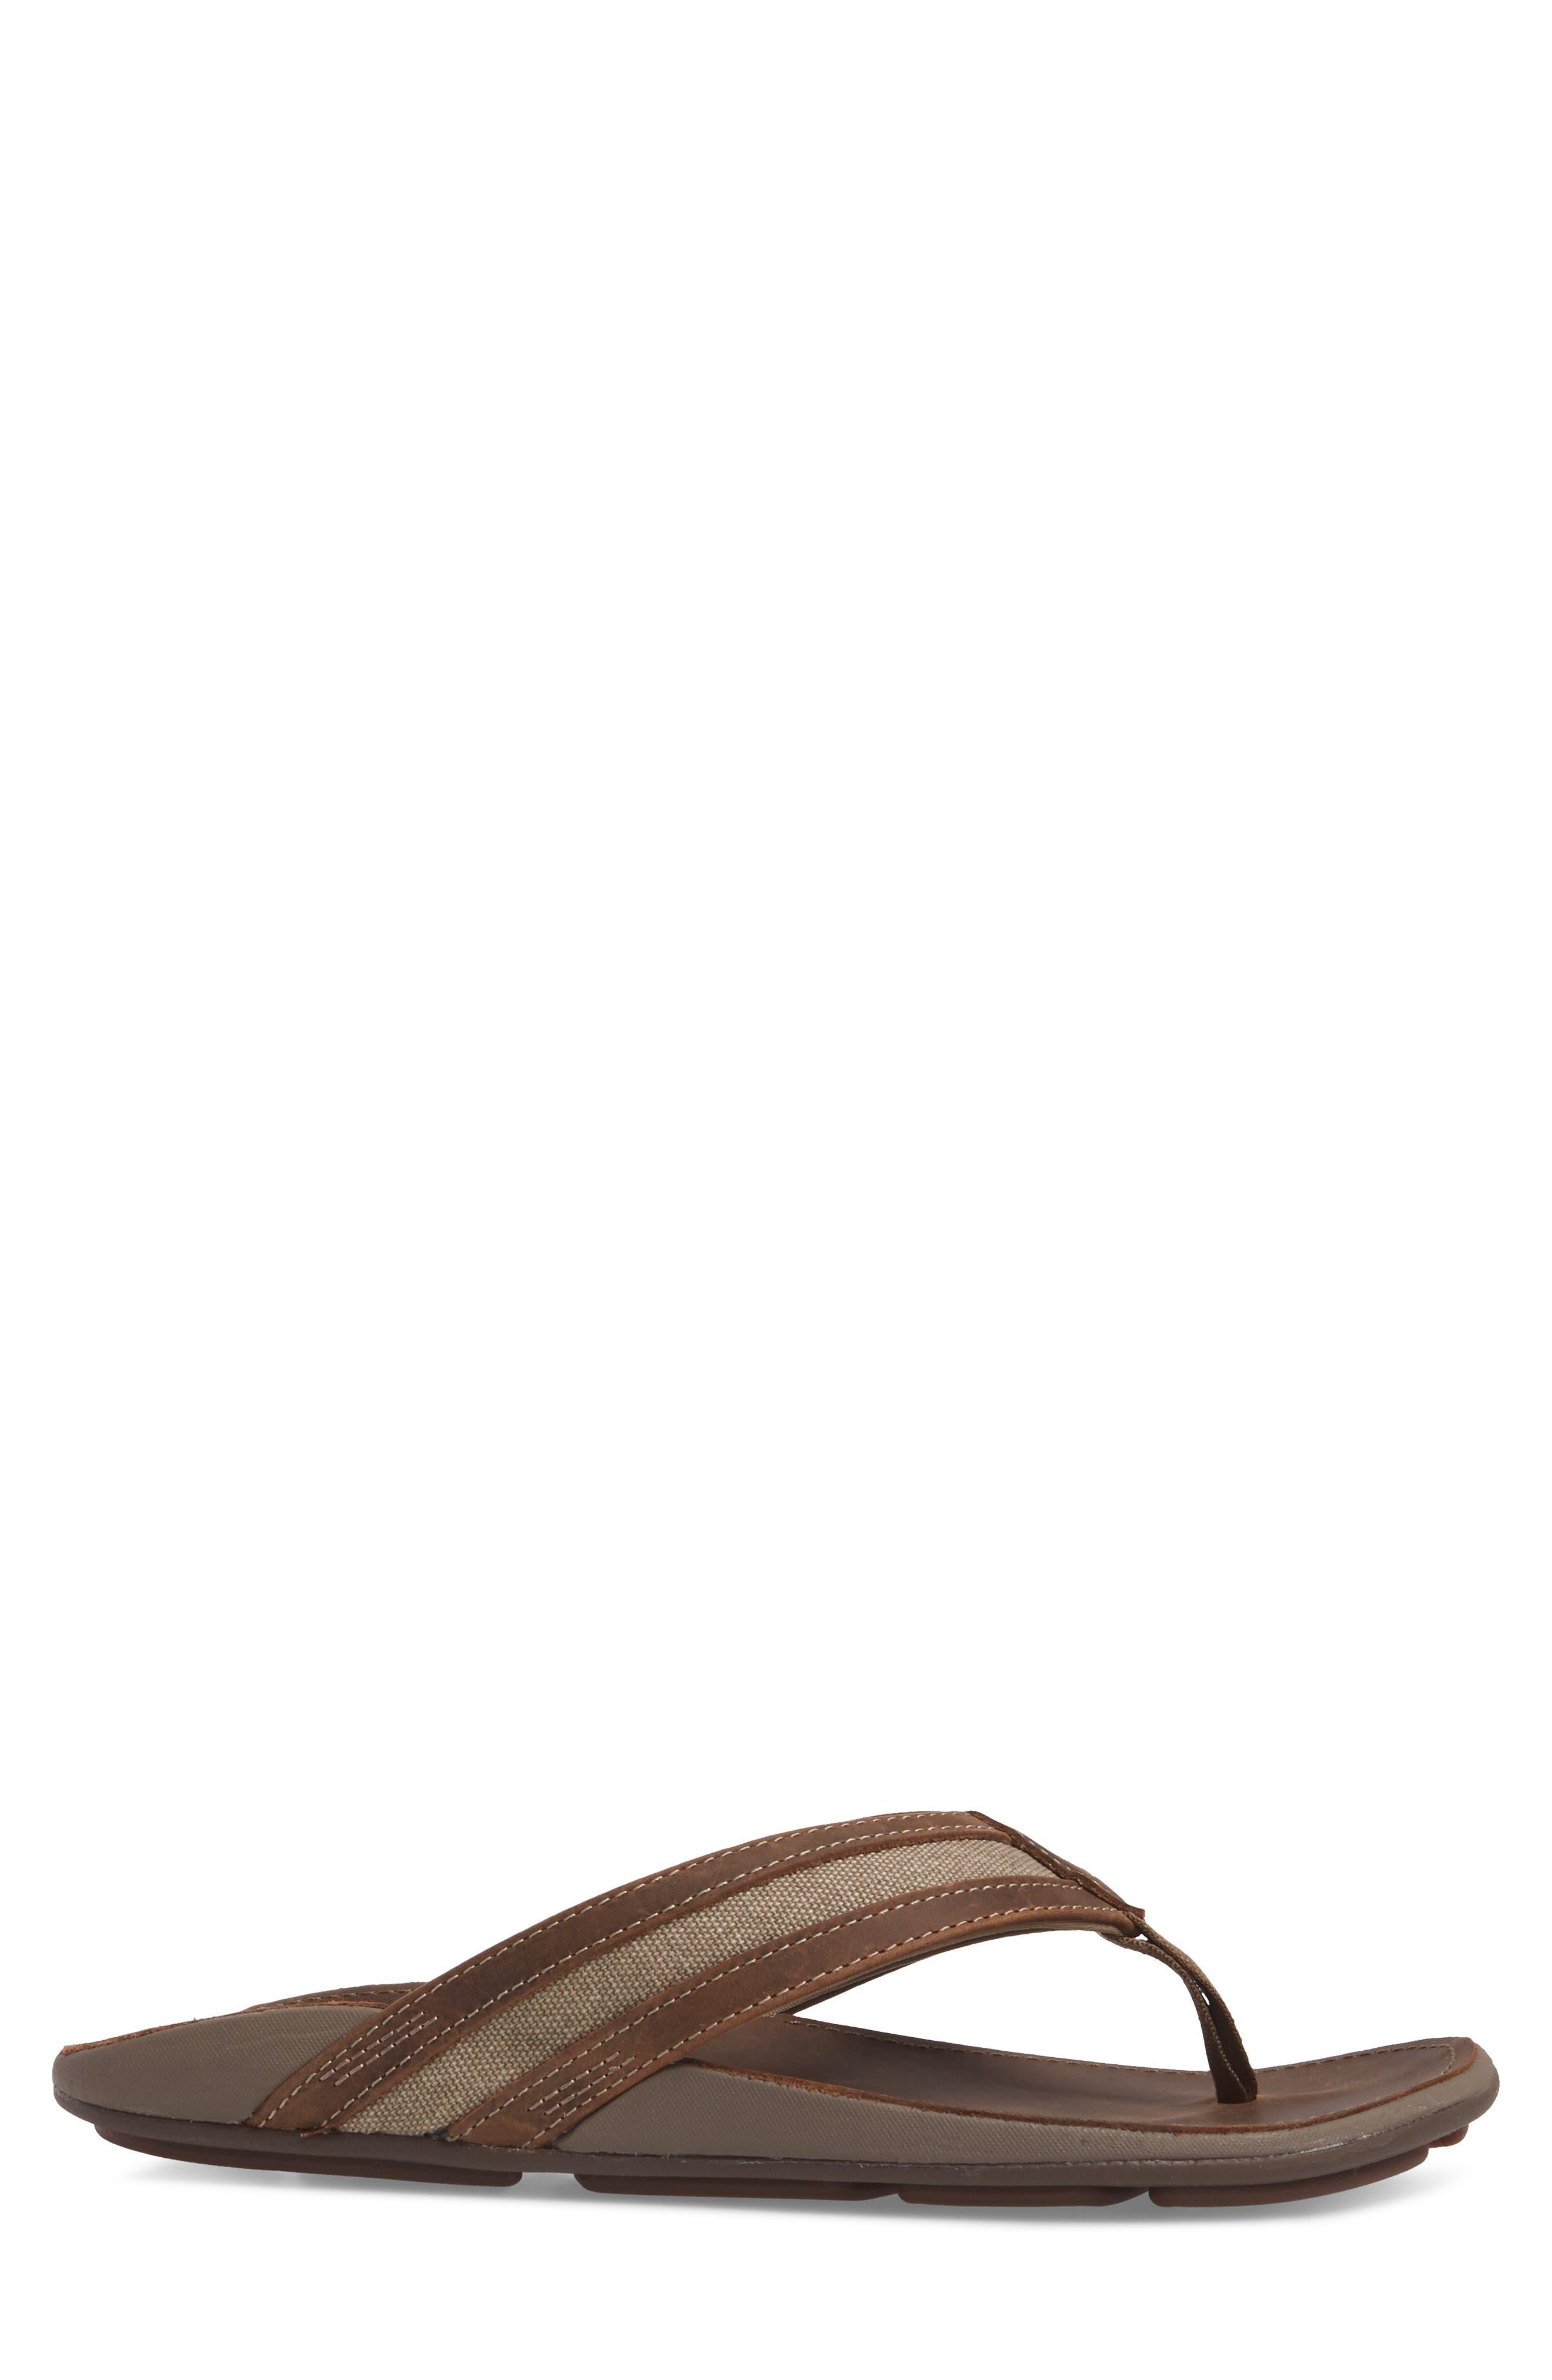 Ikoi Flip Flop,                             Alternate thumbnail 3, color,                             MUSTANG/ MUSTANG LEATHER